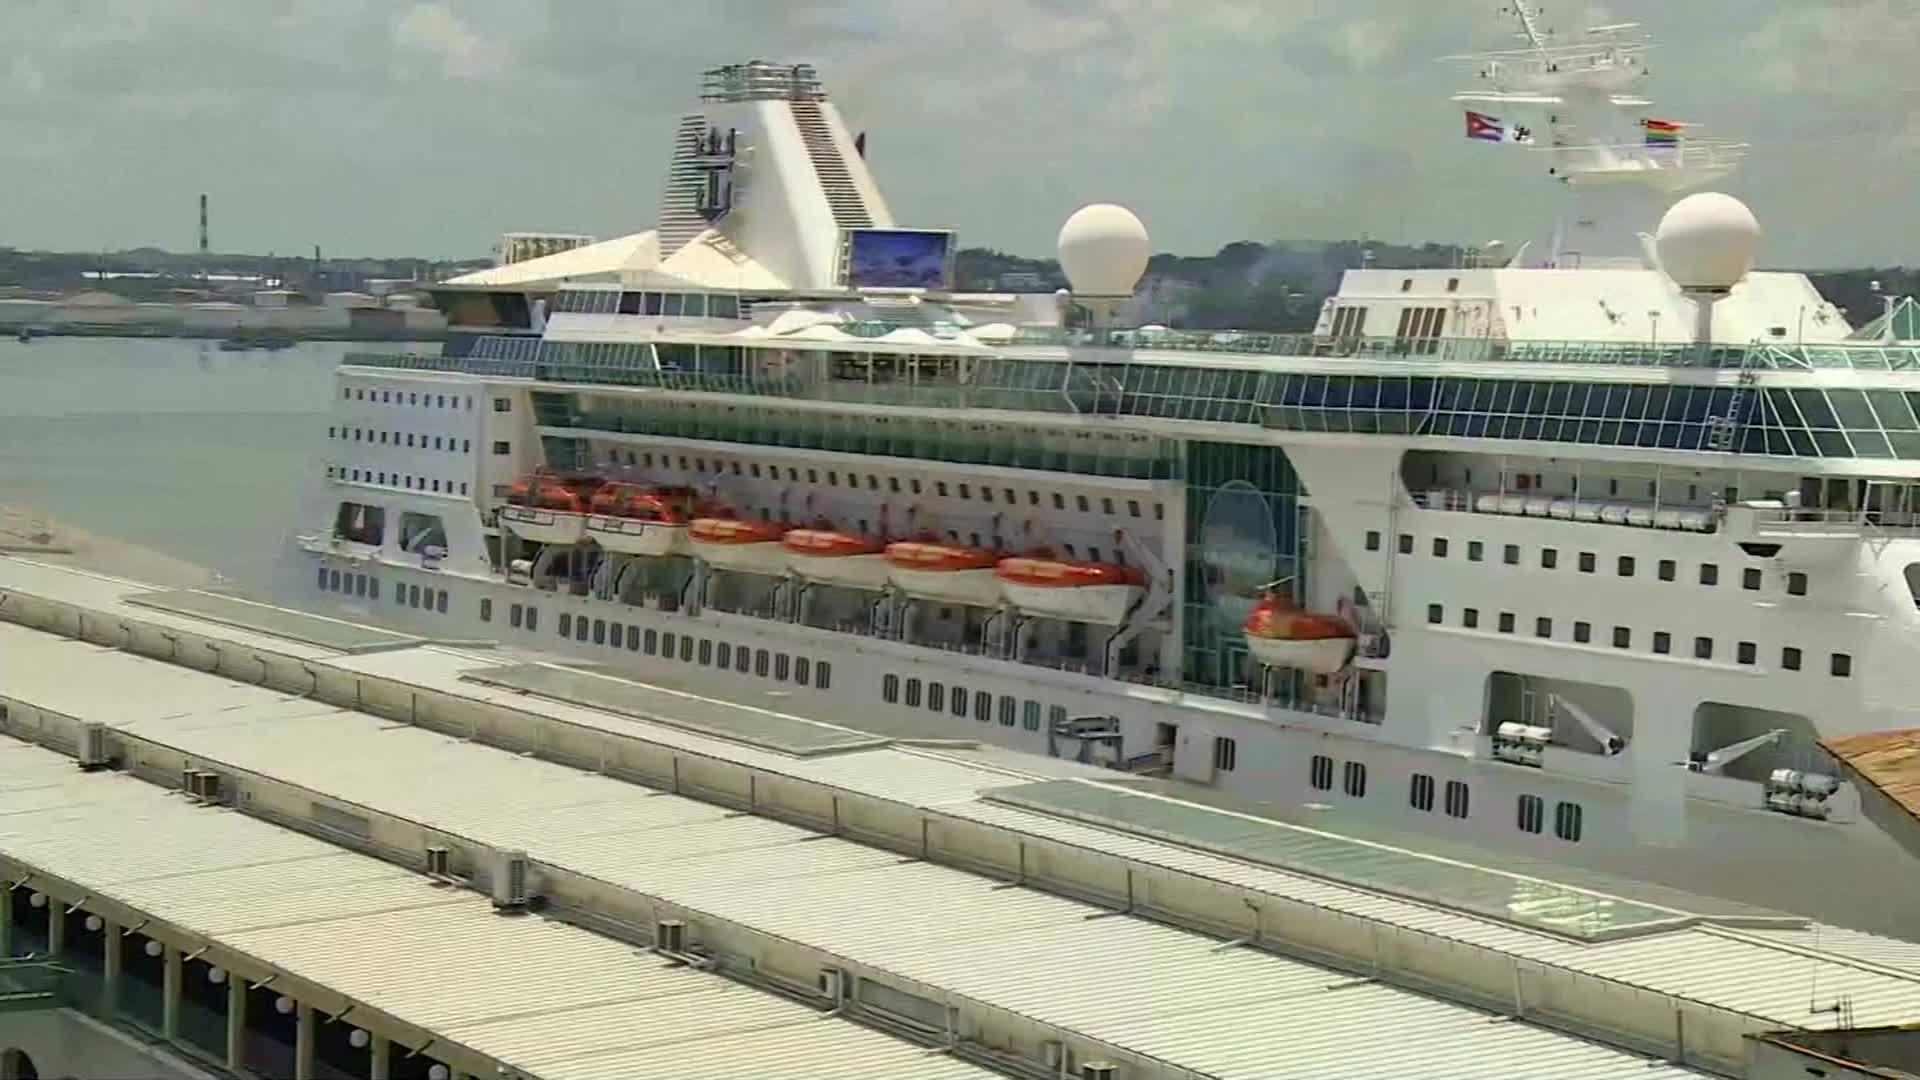 Cuba: Cruise ships change course over U.S. sanctions